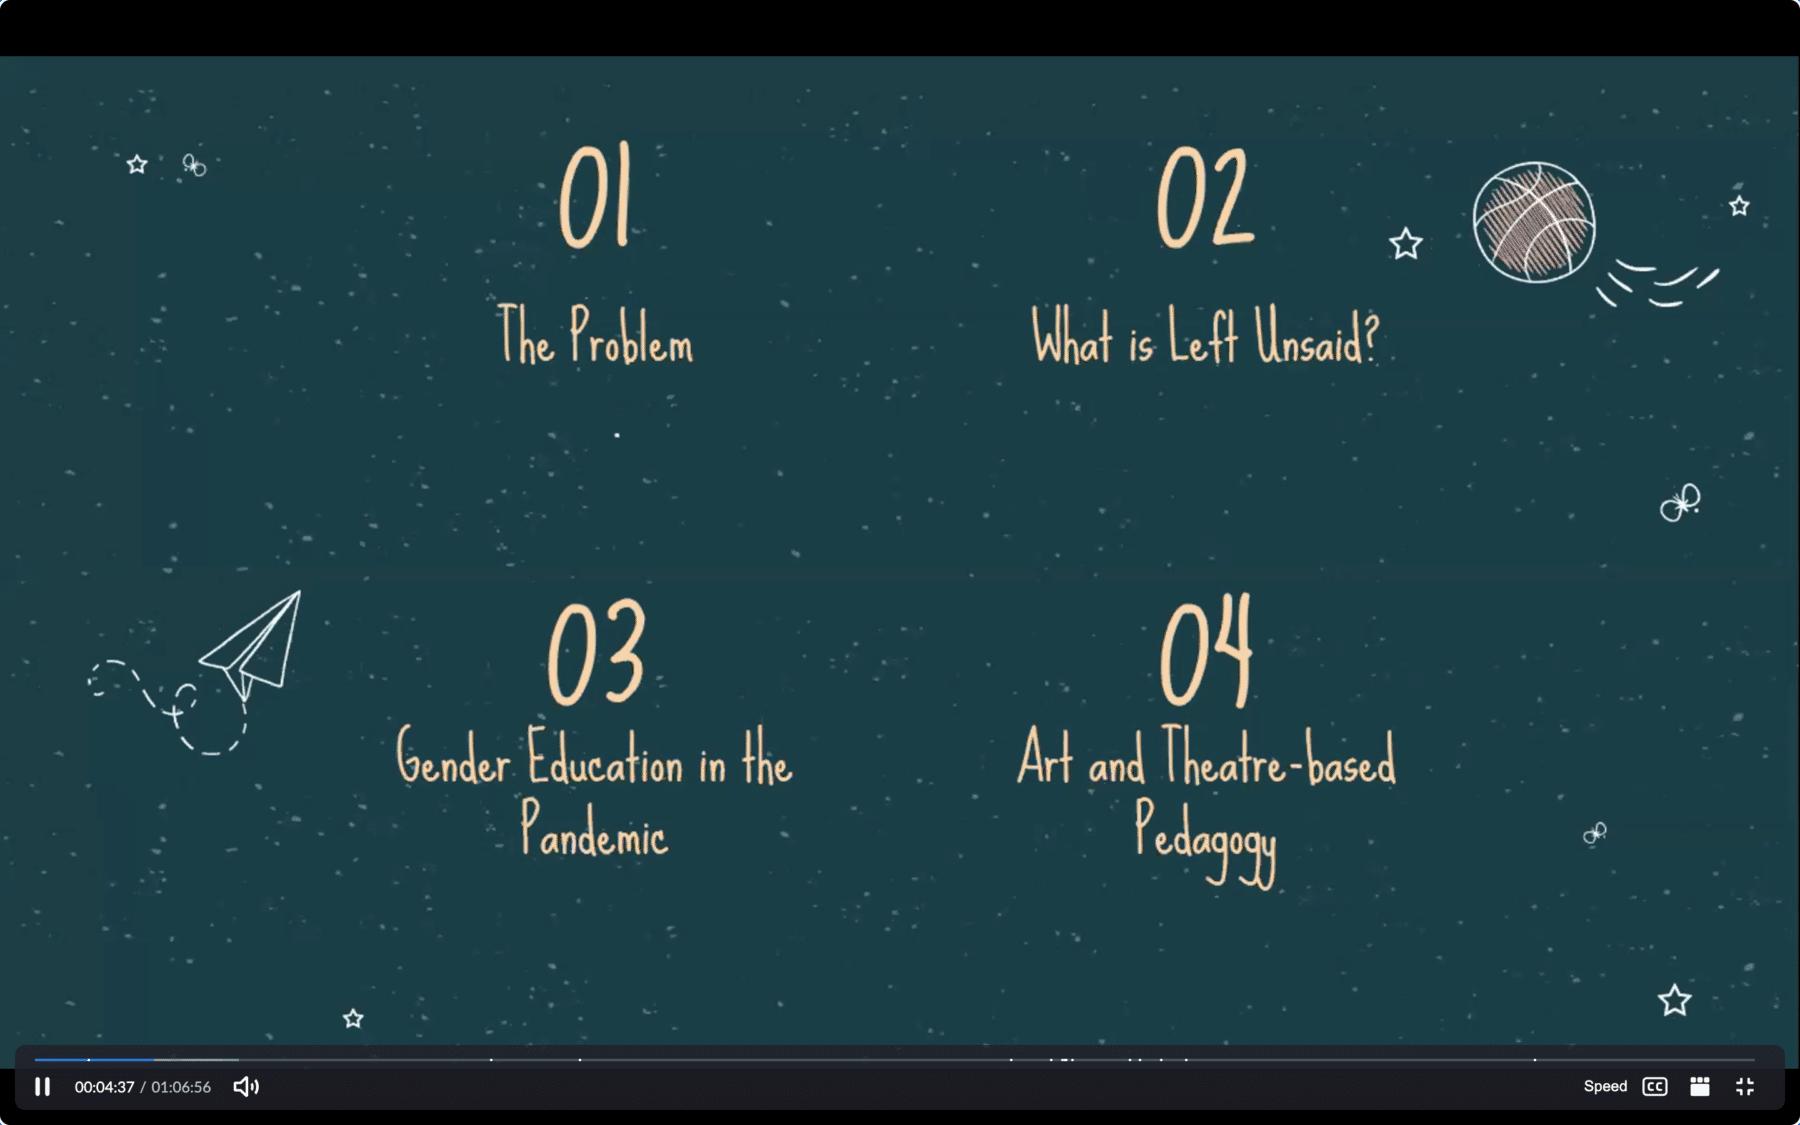 A screen shot from the presentation by Amiya